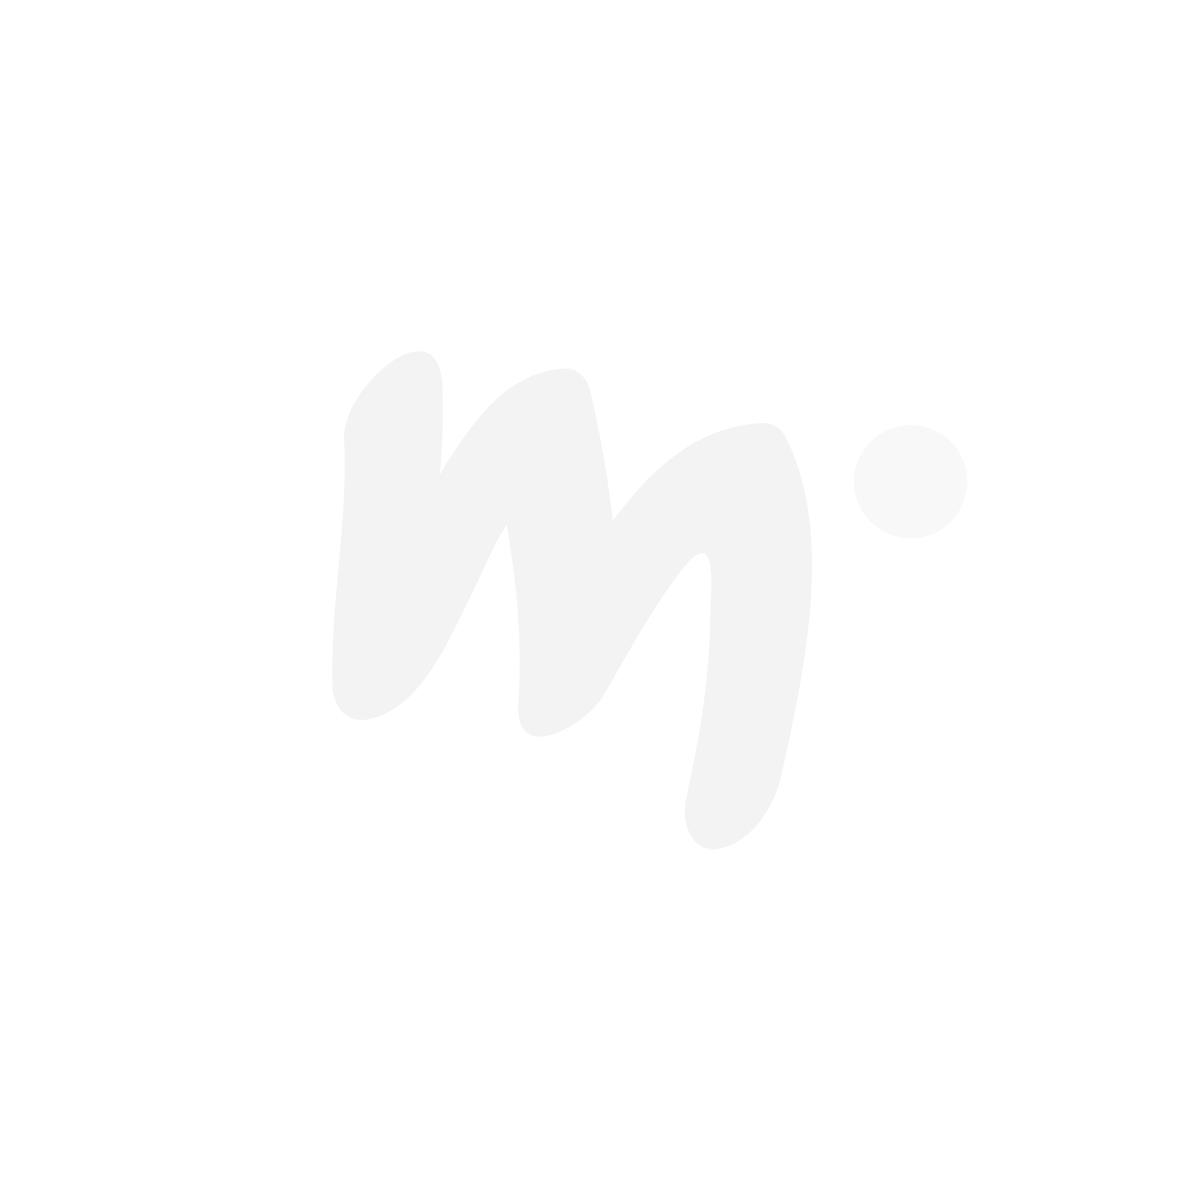 Moomin Snorkmaiden's Jewellery Set